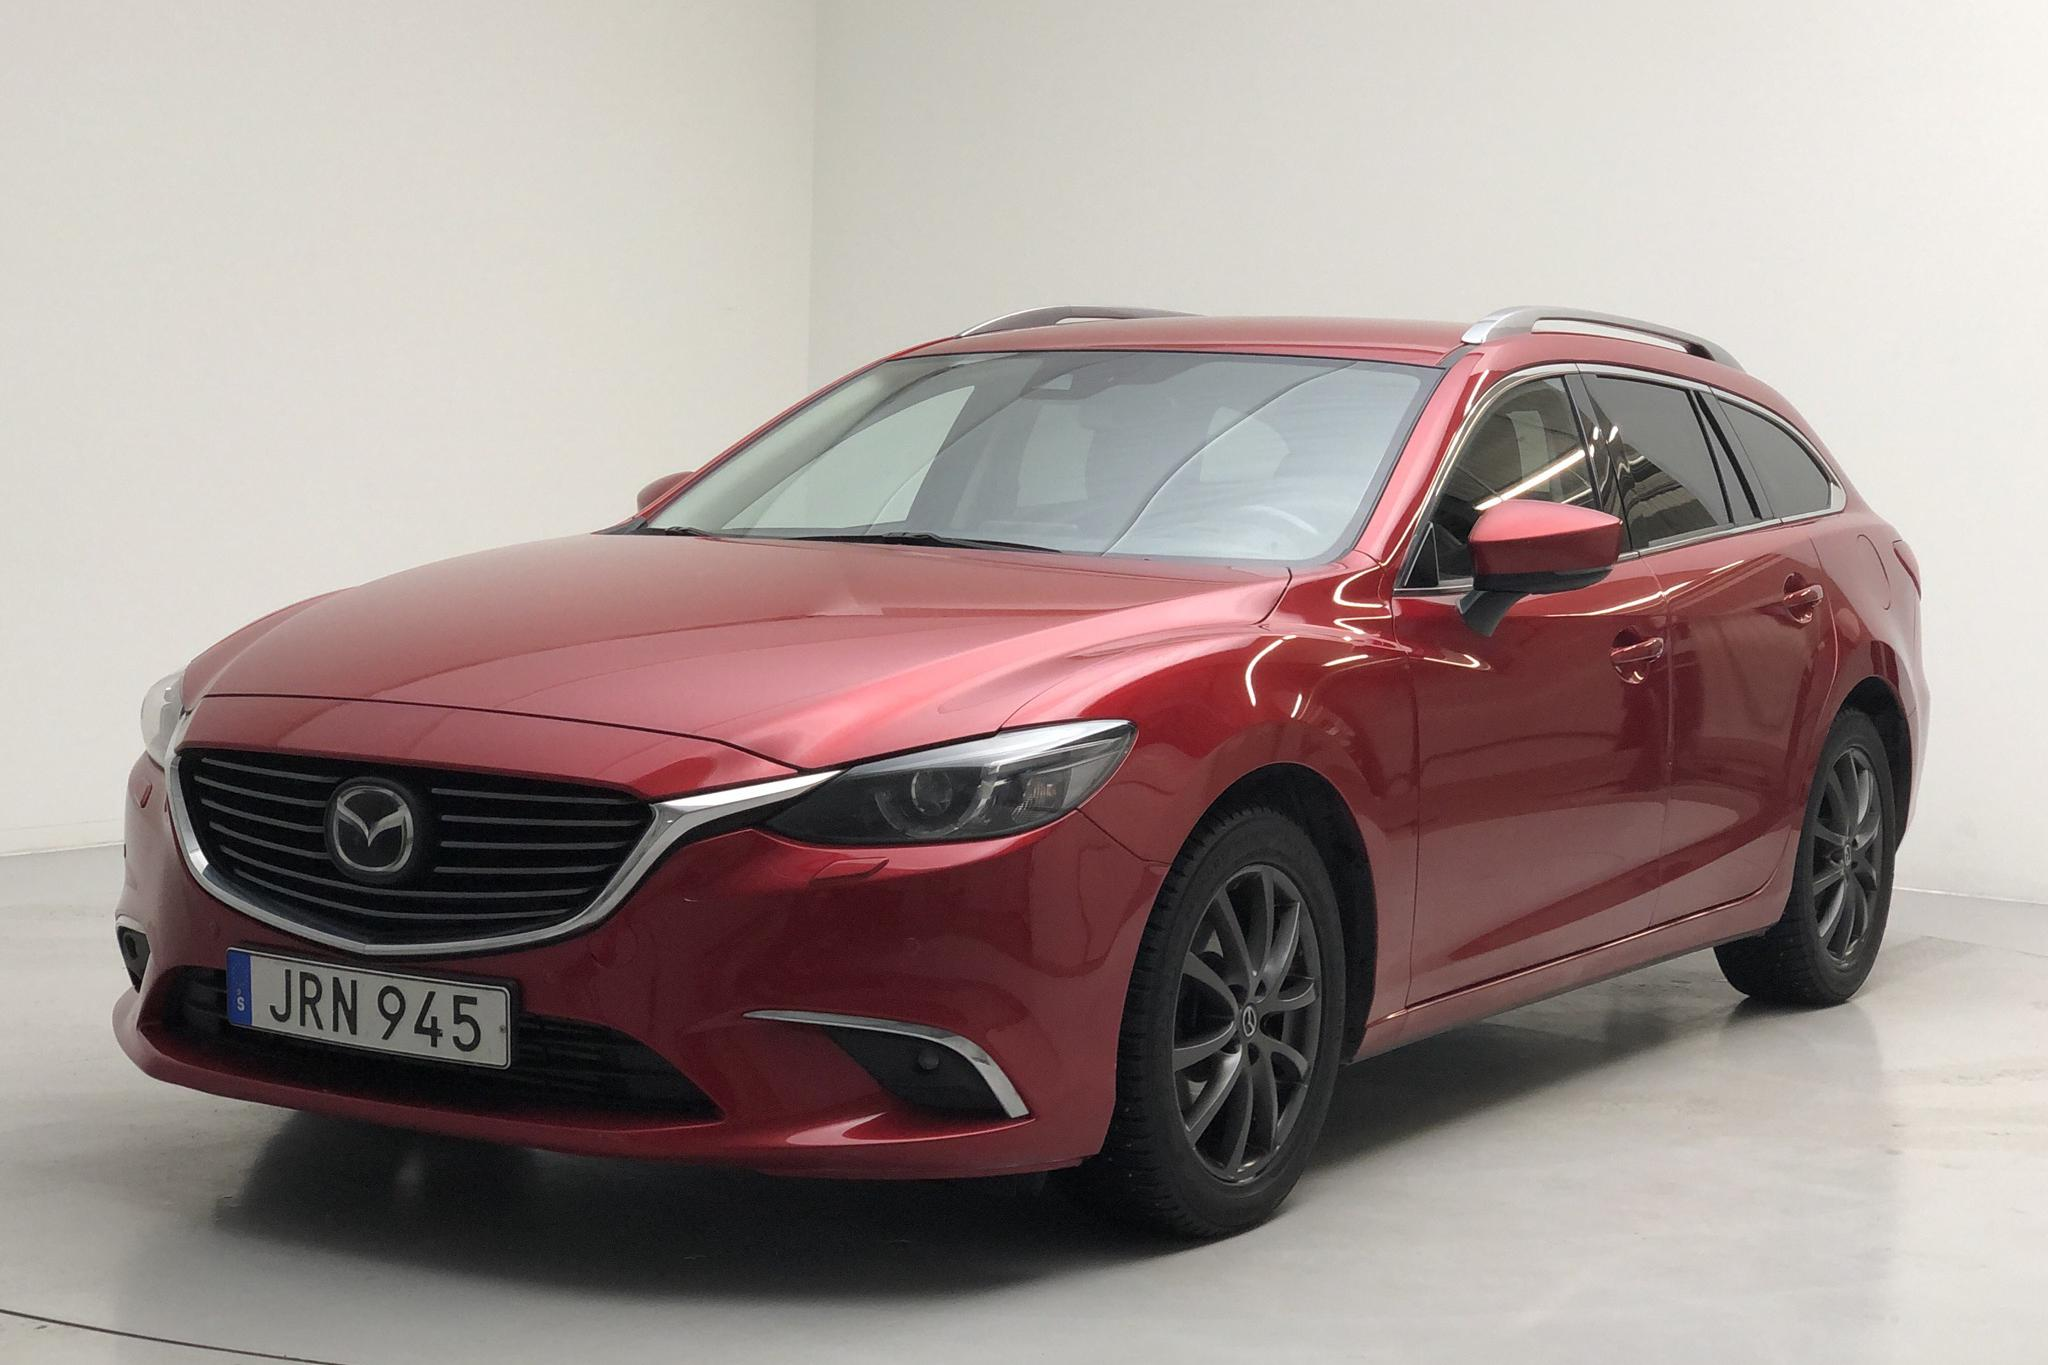 Mazda 6 2.2 DE Kombi AWD (175hk) - 14 688 mil - Automat - röd - 2017